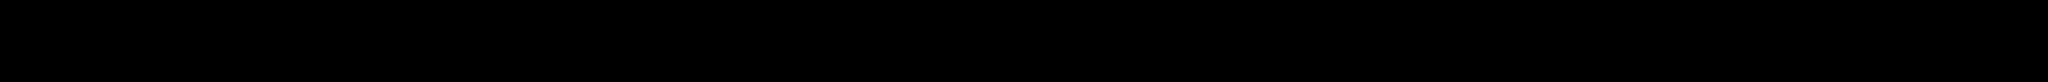 A.B.S. MR128810 Vaijeri, seisontajarru